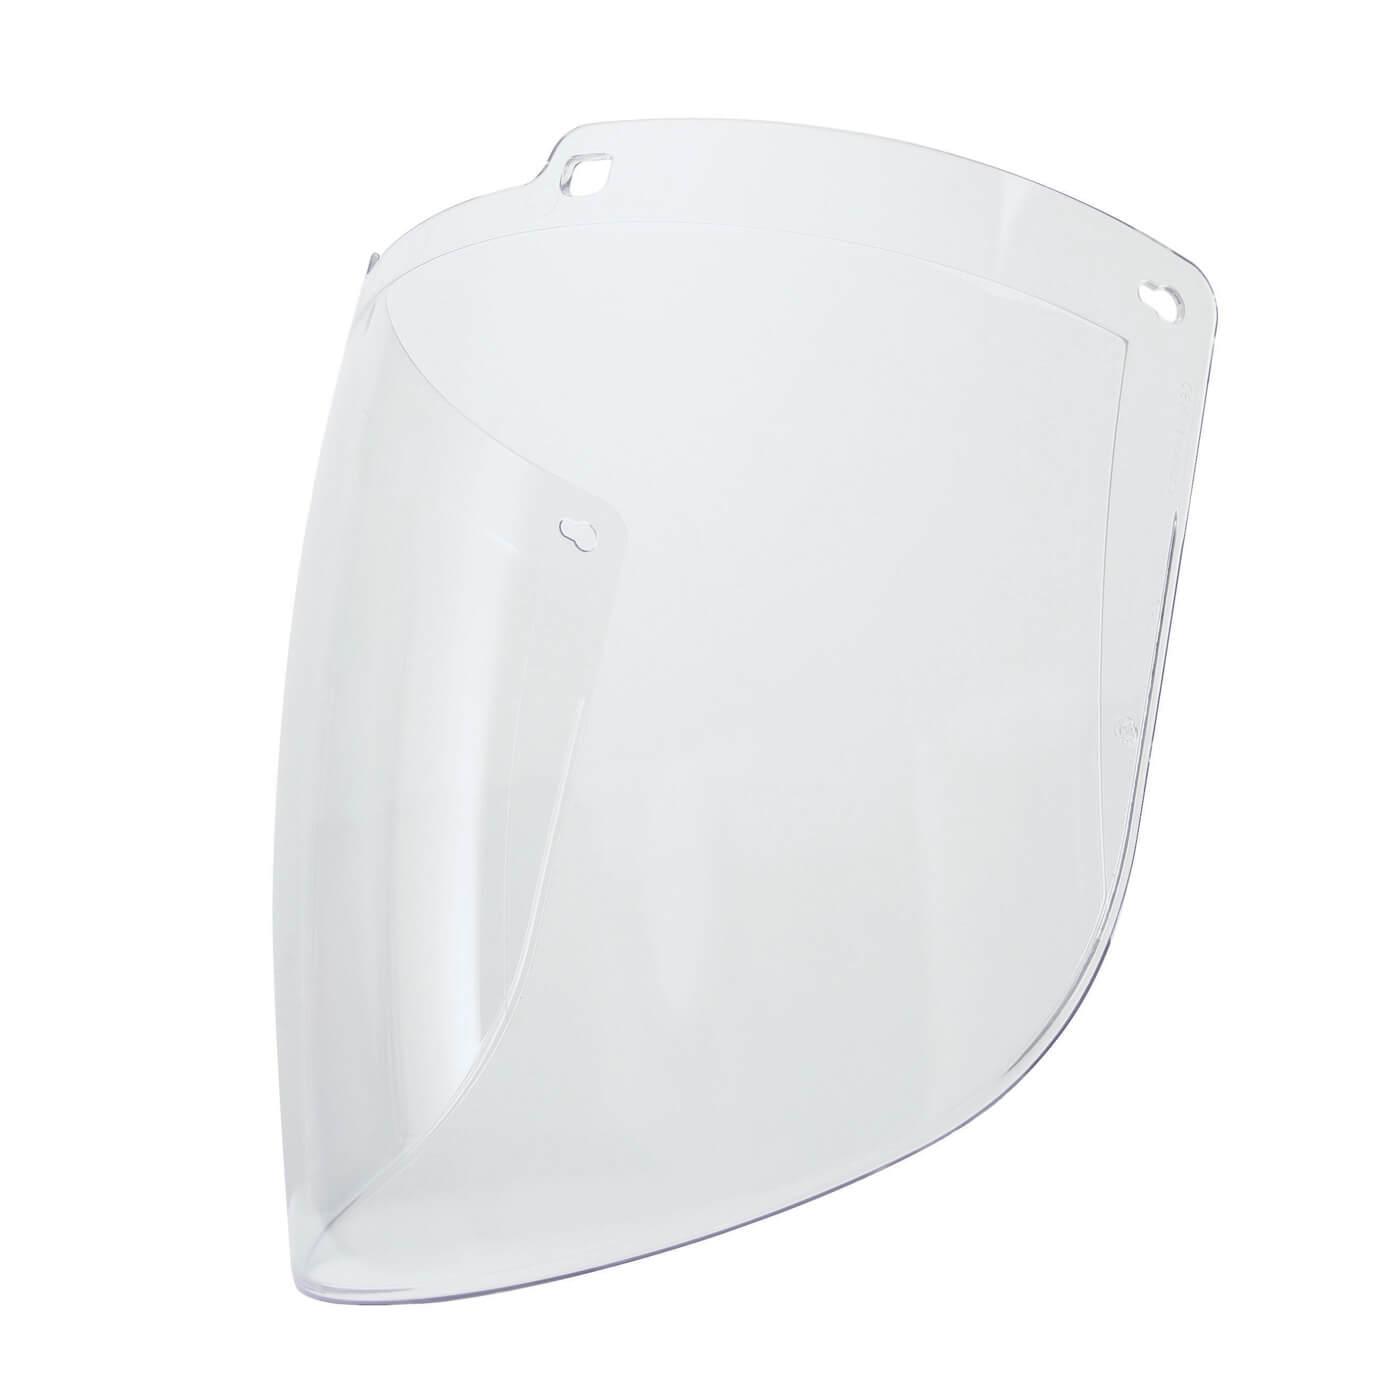 Szyba UV 5.0 do osłony Turboshield Honeywell 1031748